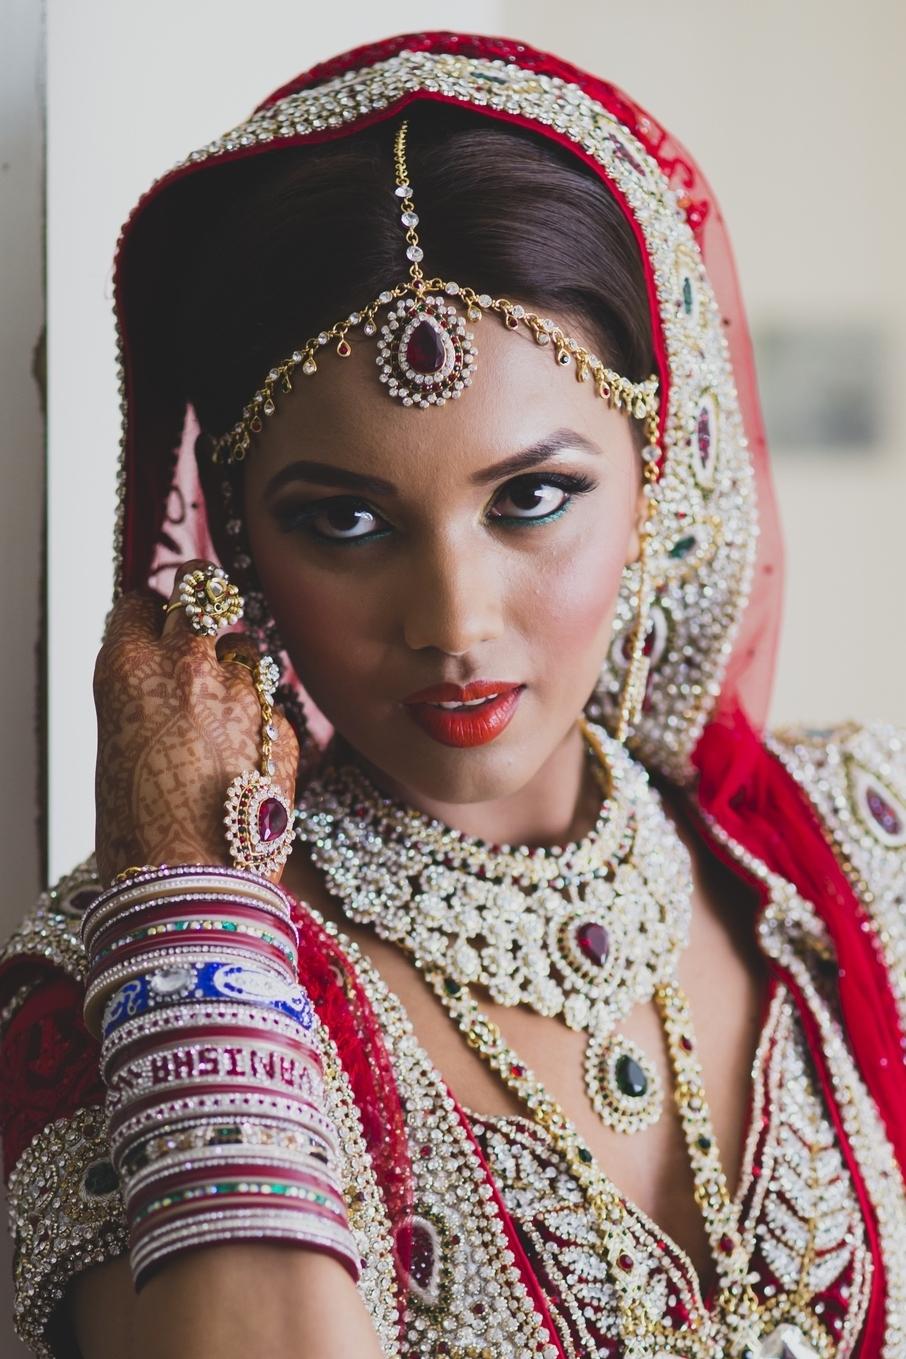 Lajeen Artistry: Versatile Indian Bridal Hair & Makeup throughout Indian Hair And Makeup Melbourne